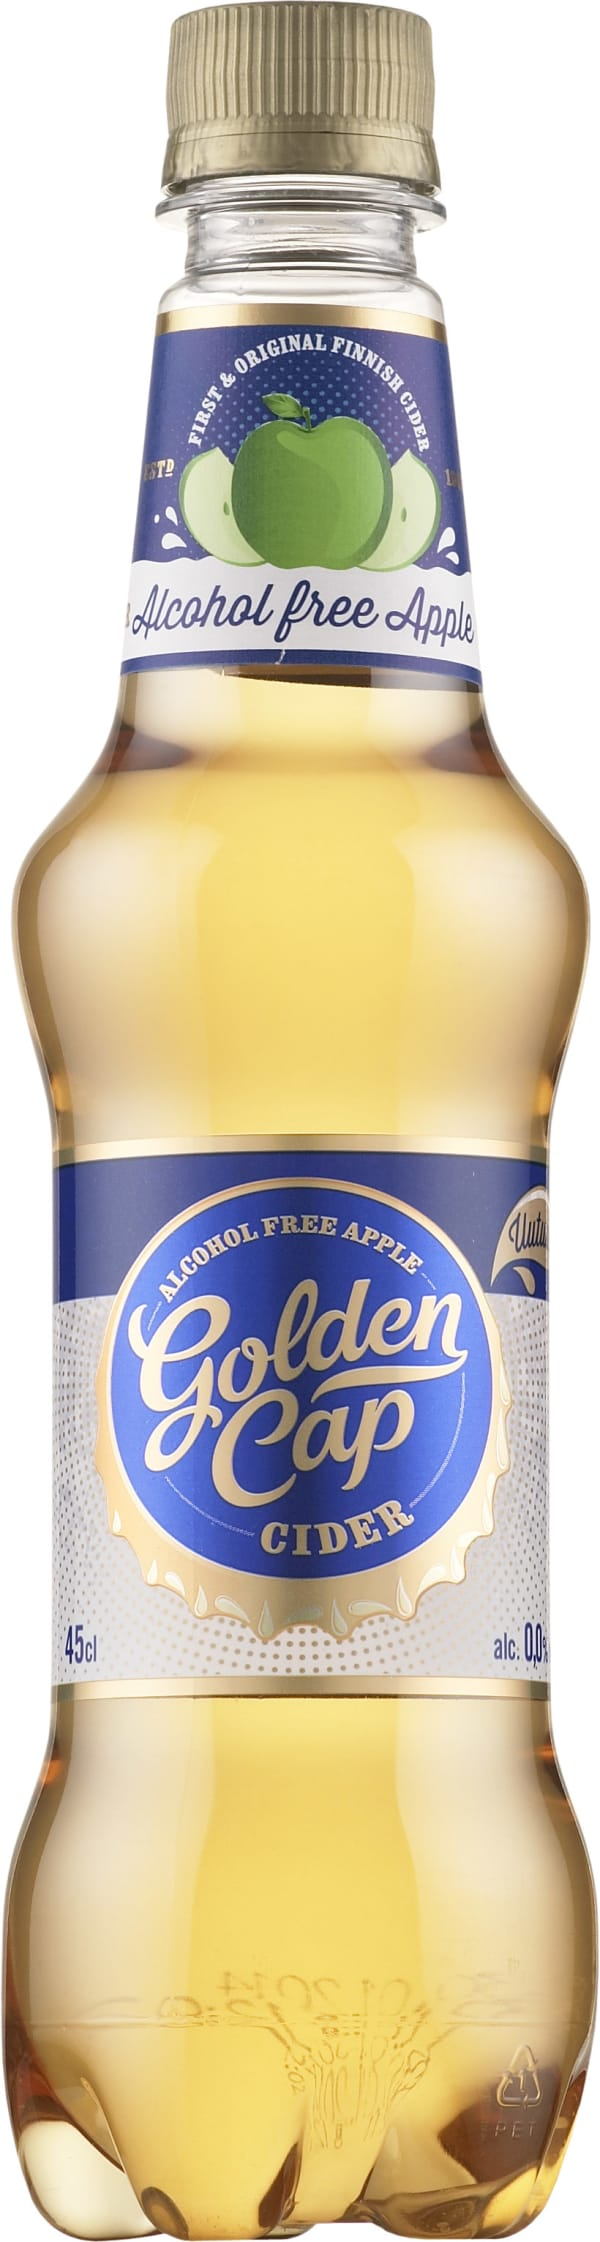 Golden Cap Alcohol Free Apple Cider  plastflaska